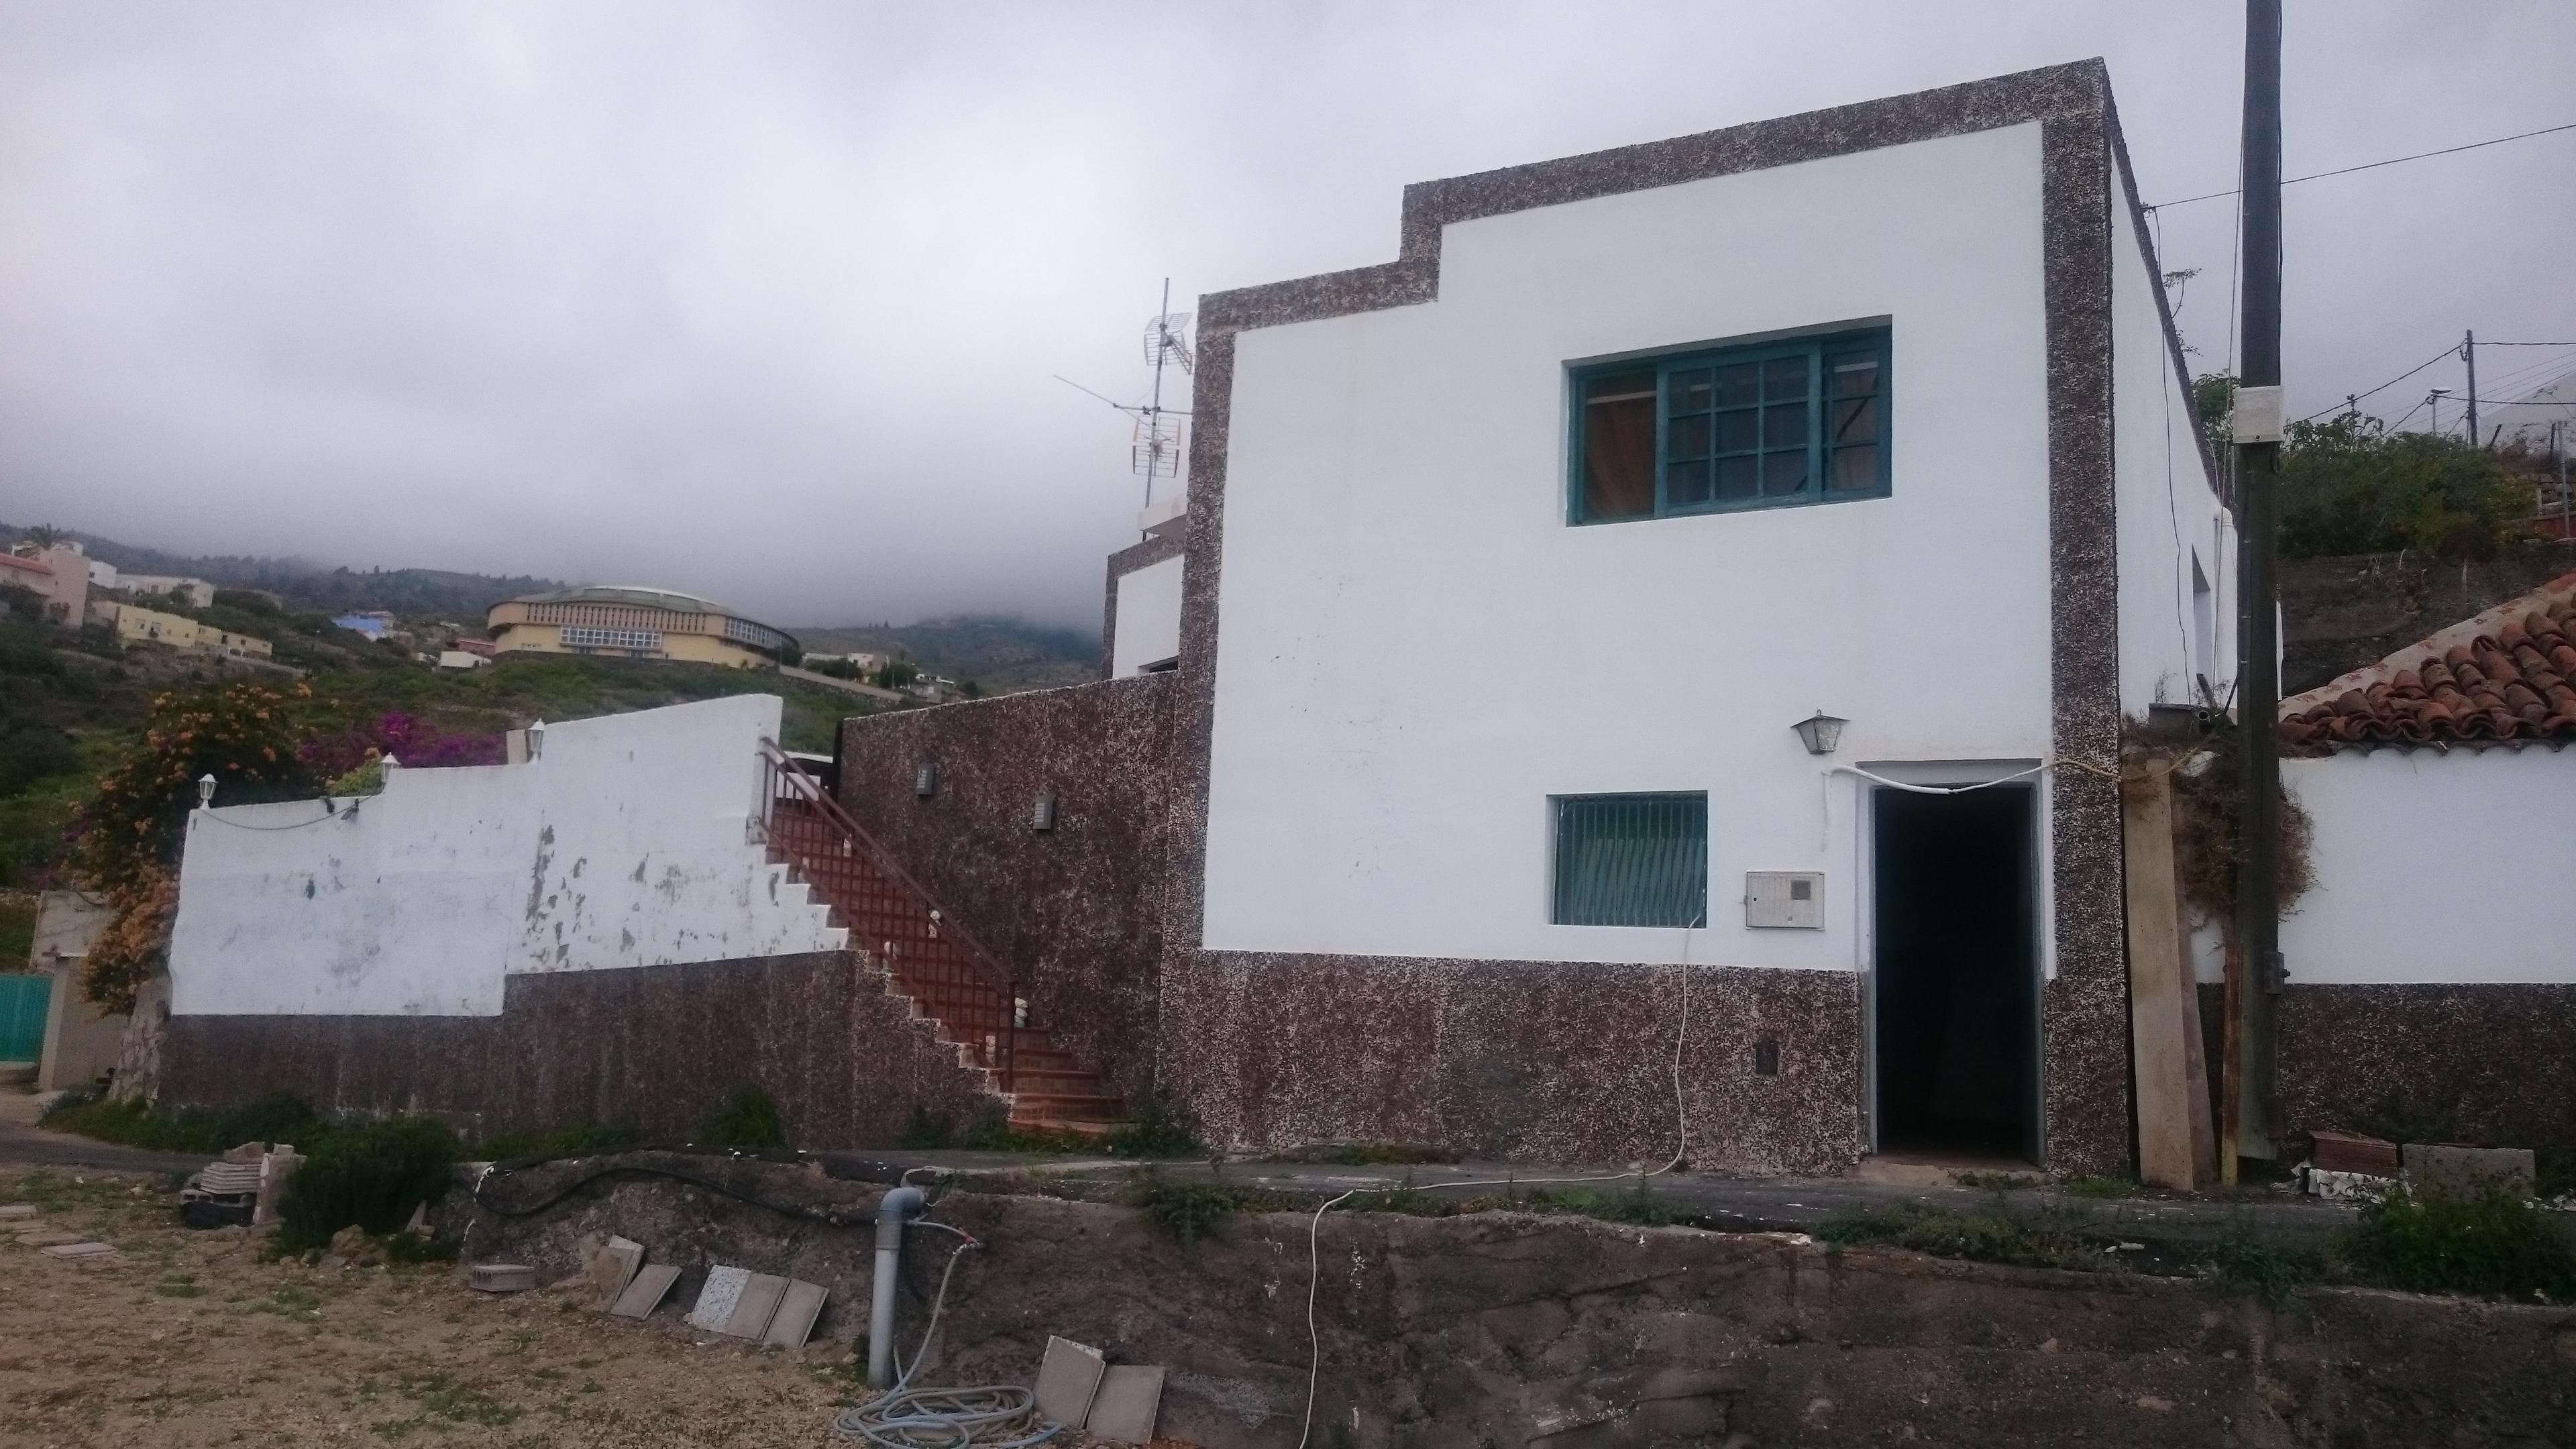 Vendita casa indipendente guimar santa cruz de tenerife for Case a tenerife in vendita